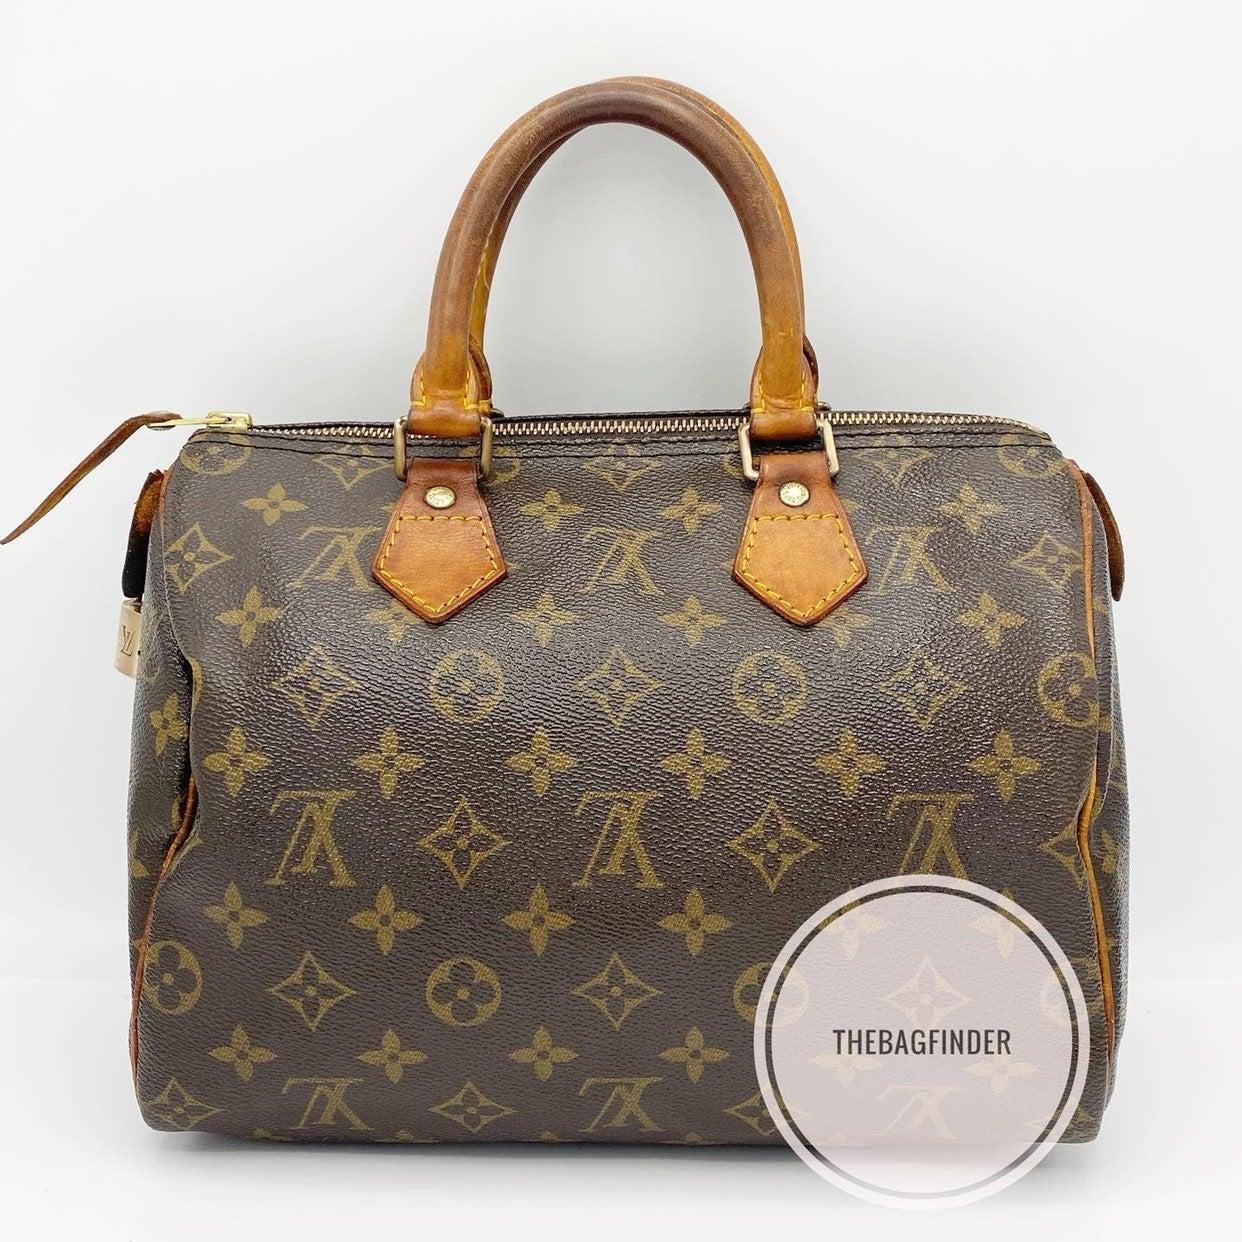 Louis Vuitton Speedy Monogram 25